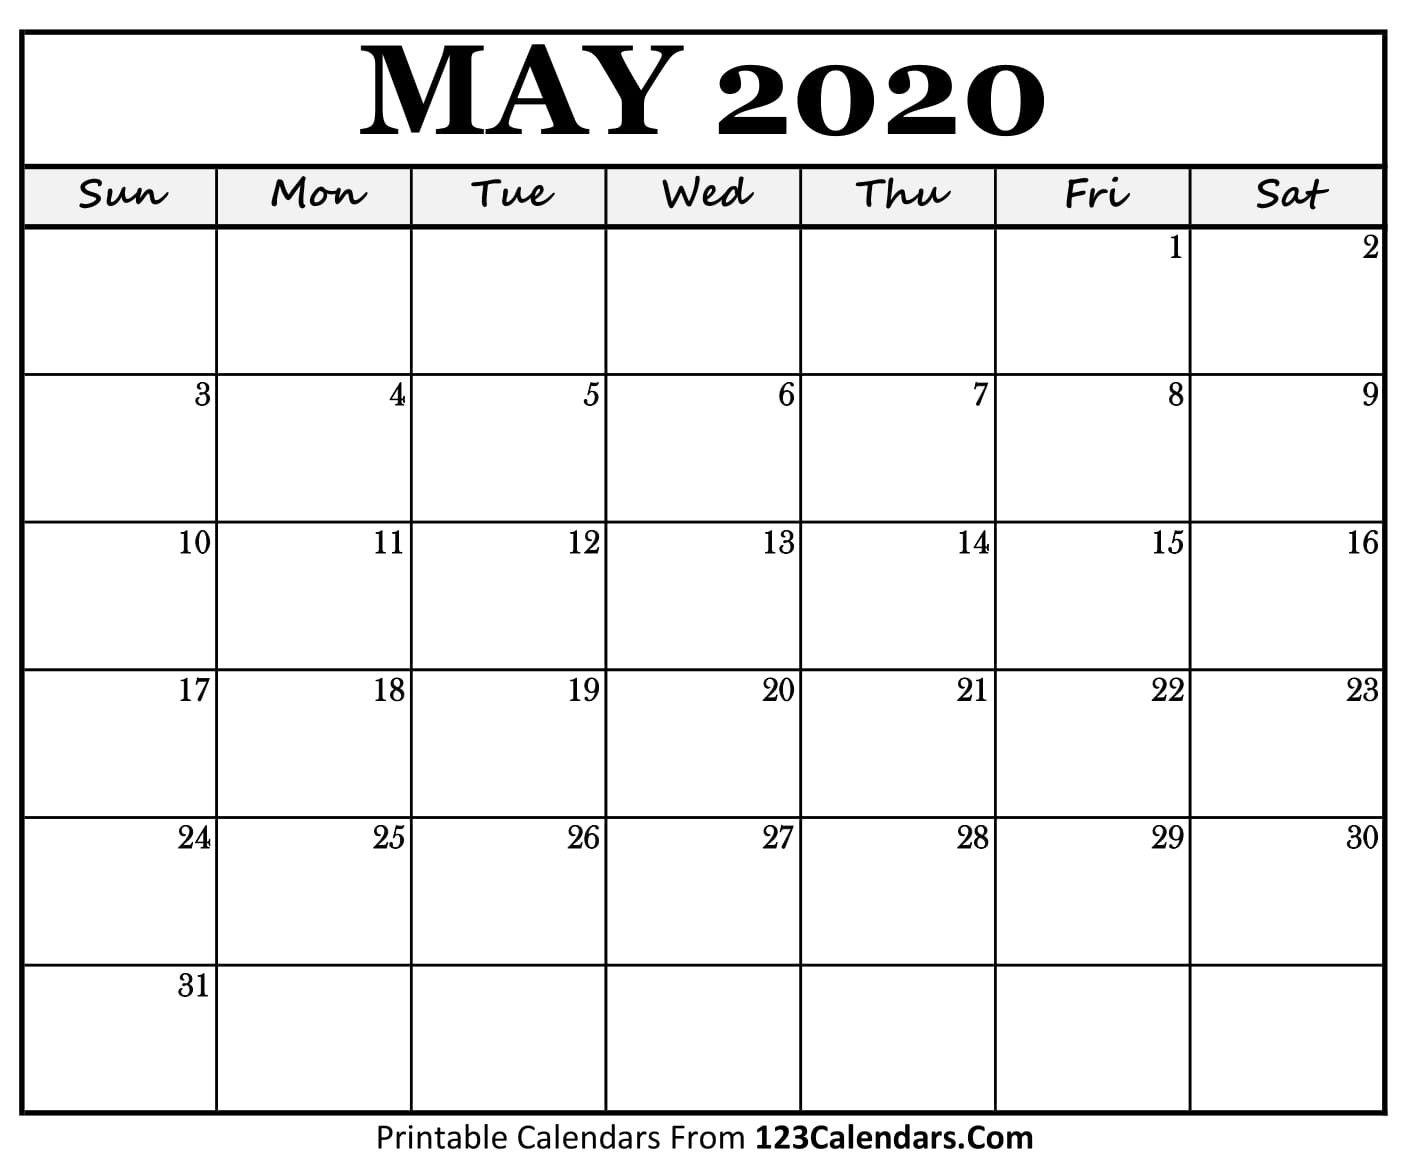 monday to sunday may 2020 template | calendar template